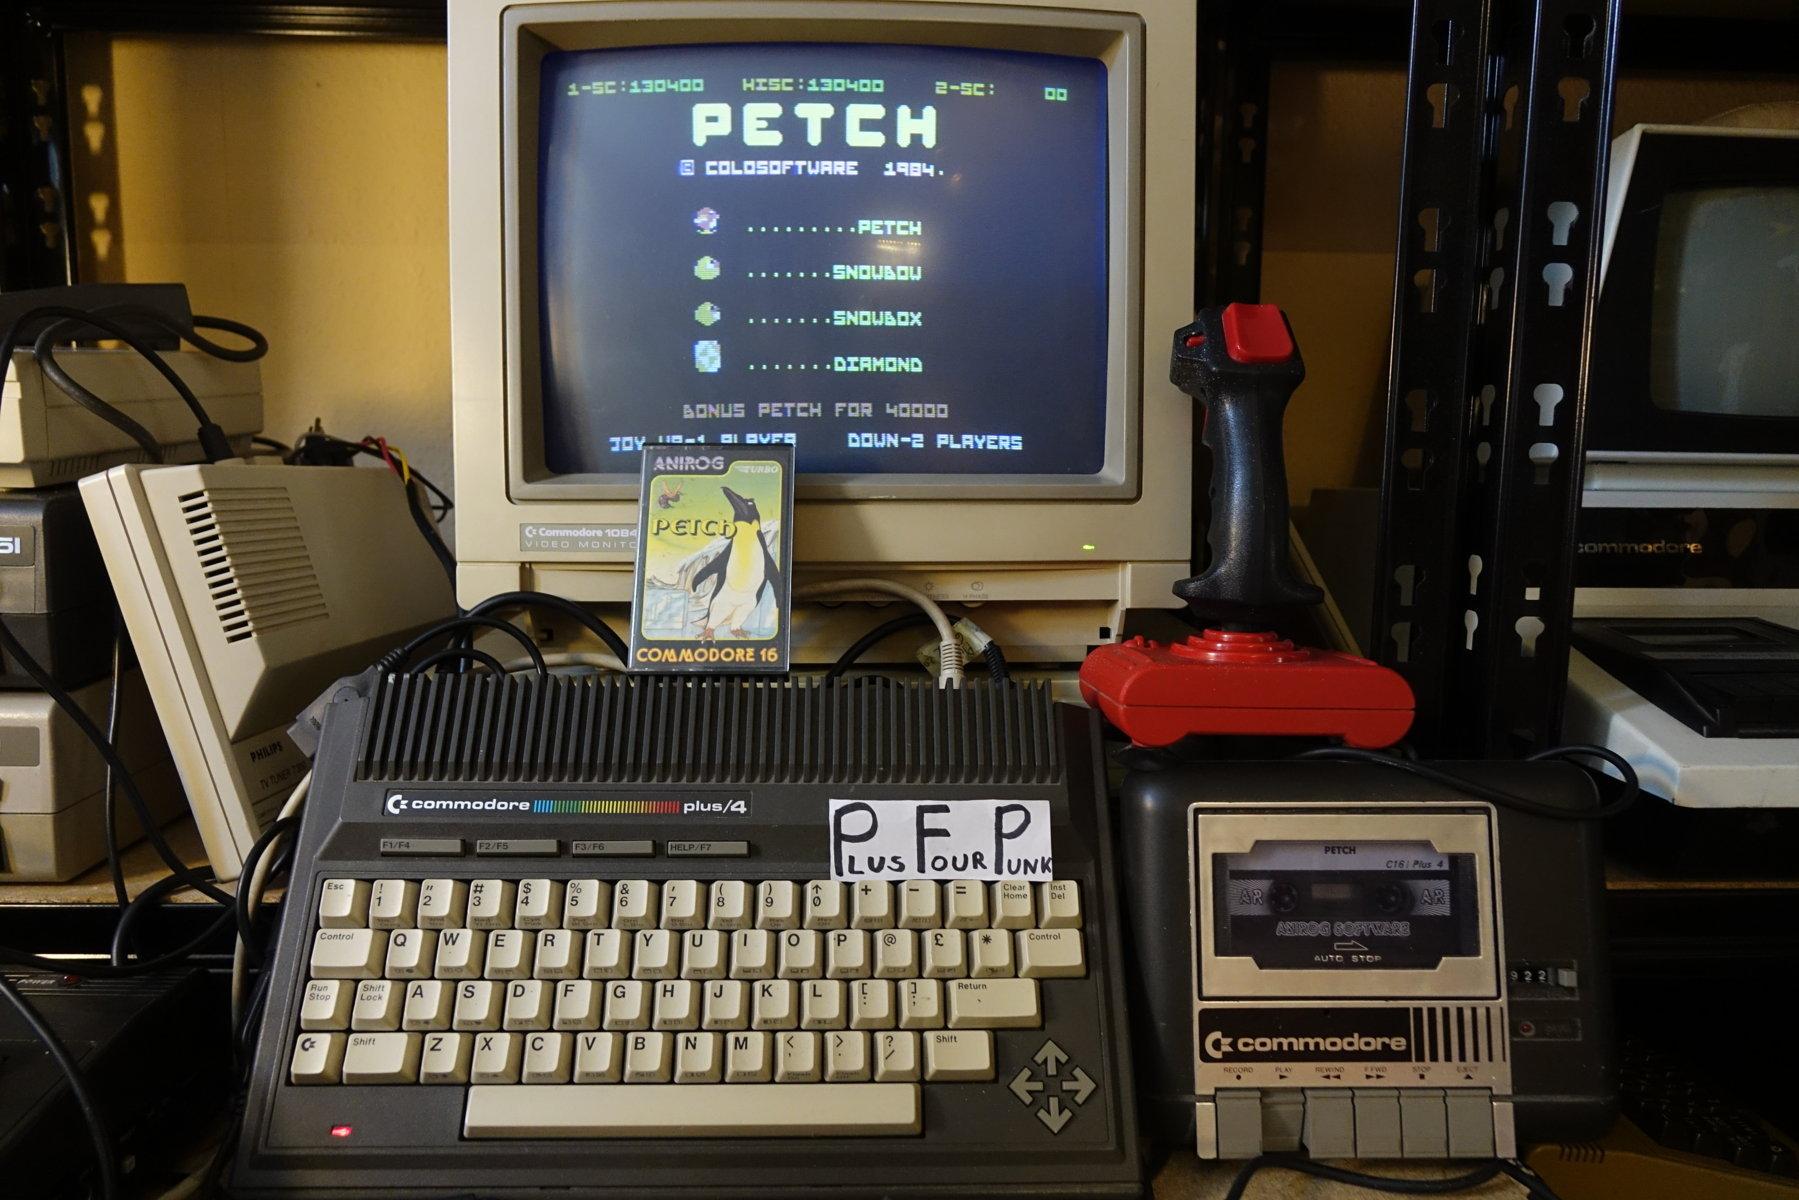 plus4punk: Petch (Commodore 16/Plus4) 130,400 points on 2020-06-13 16:10:01